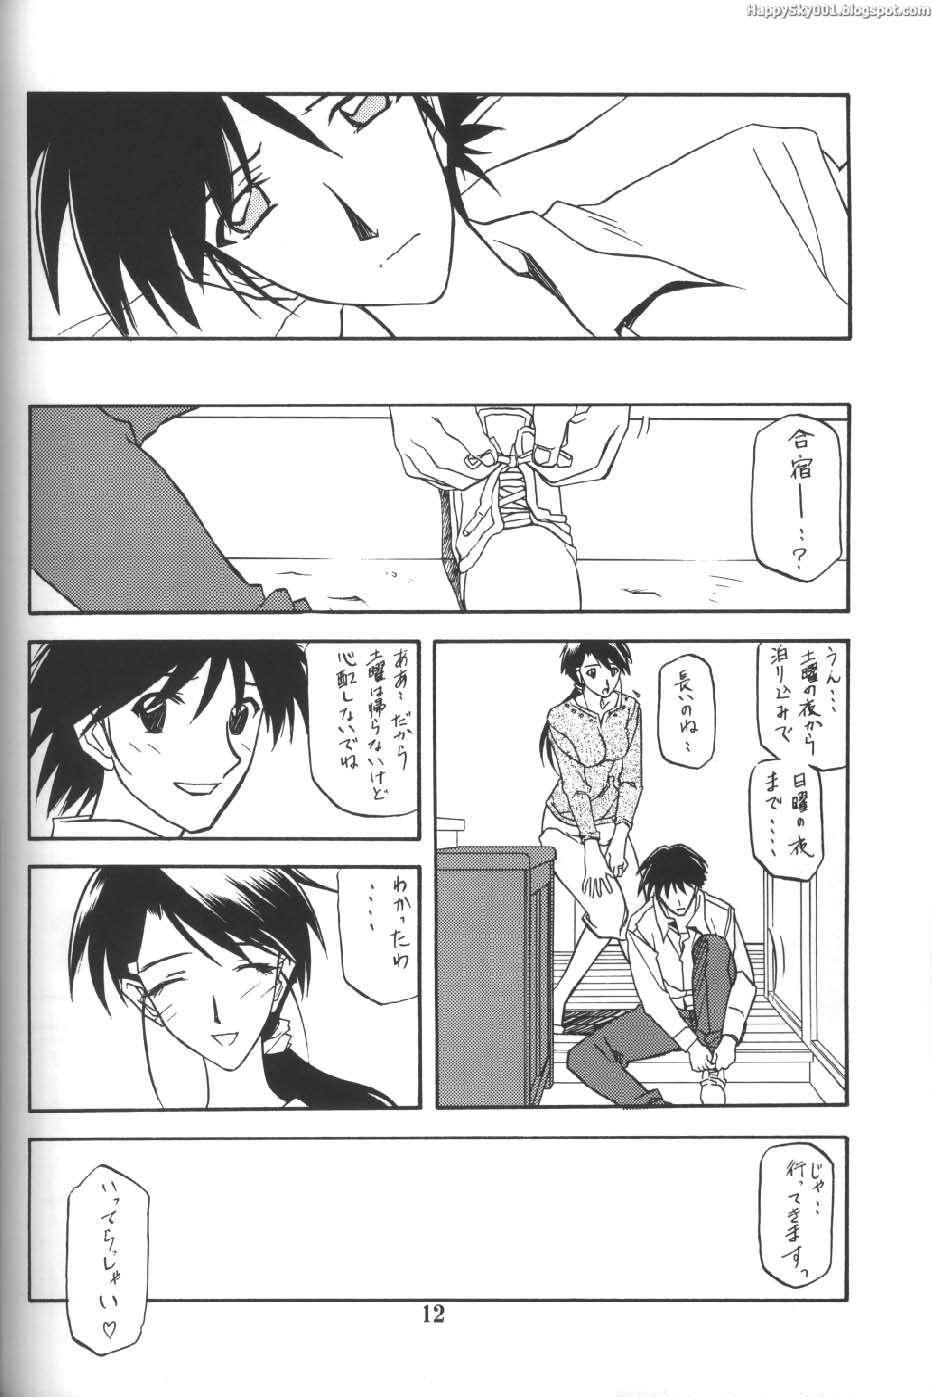 Yama Hime no Mi 10